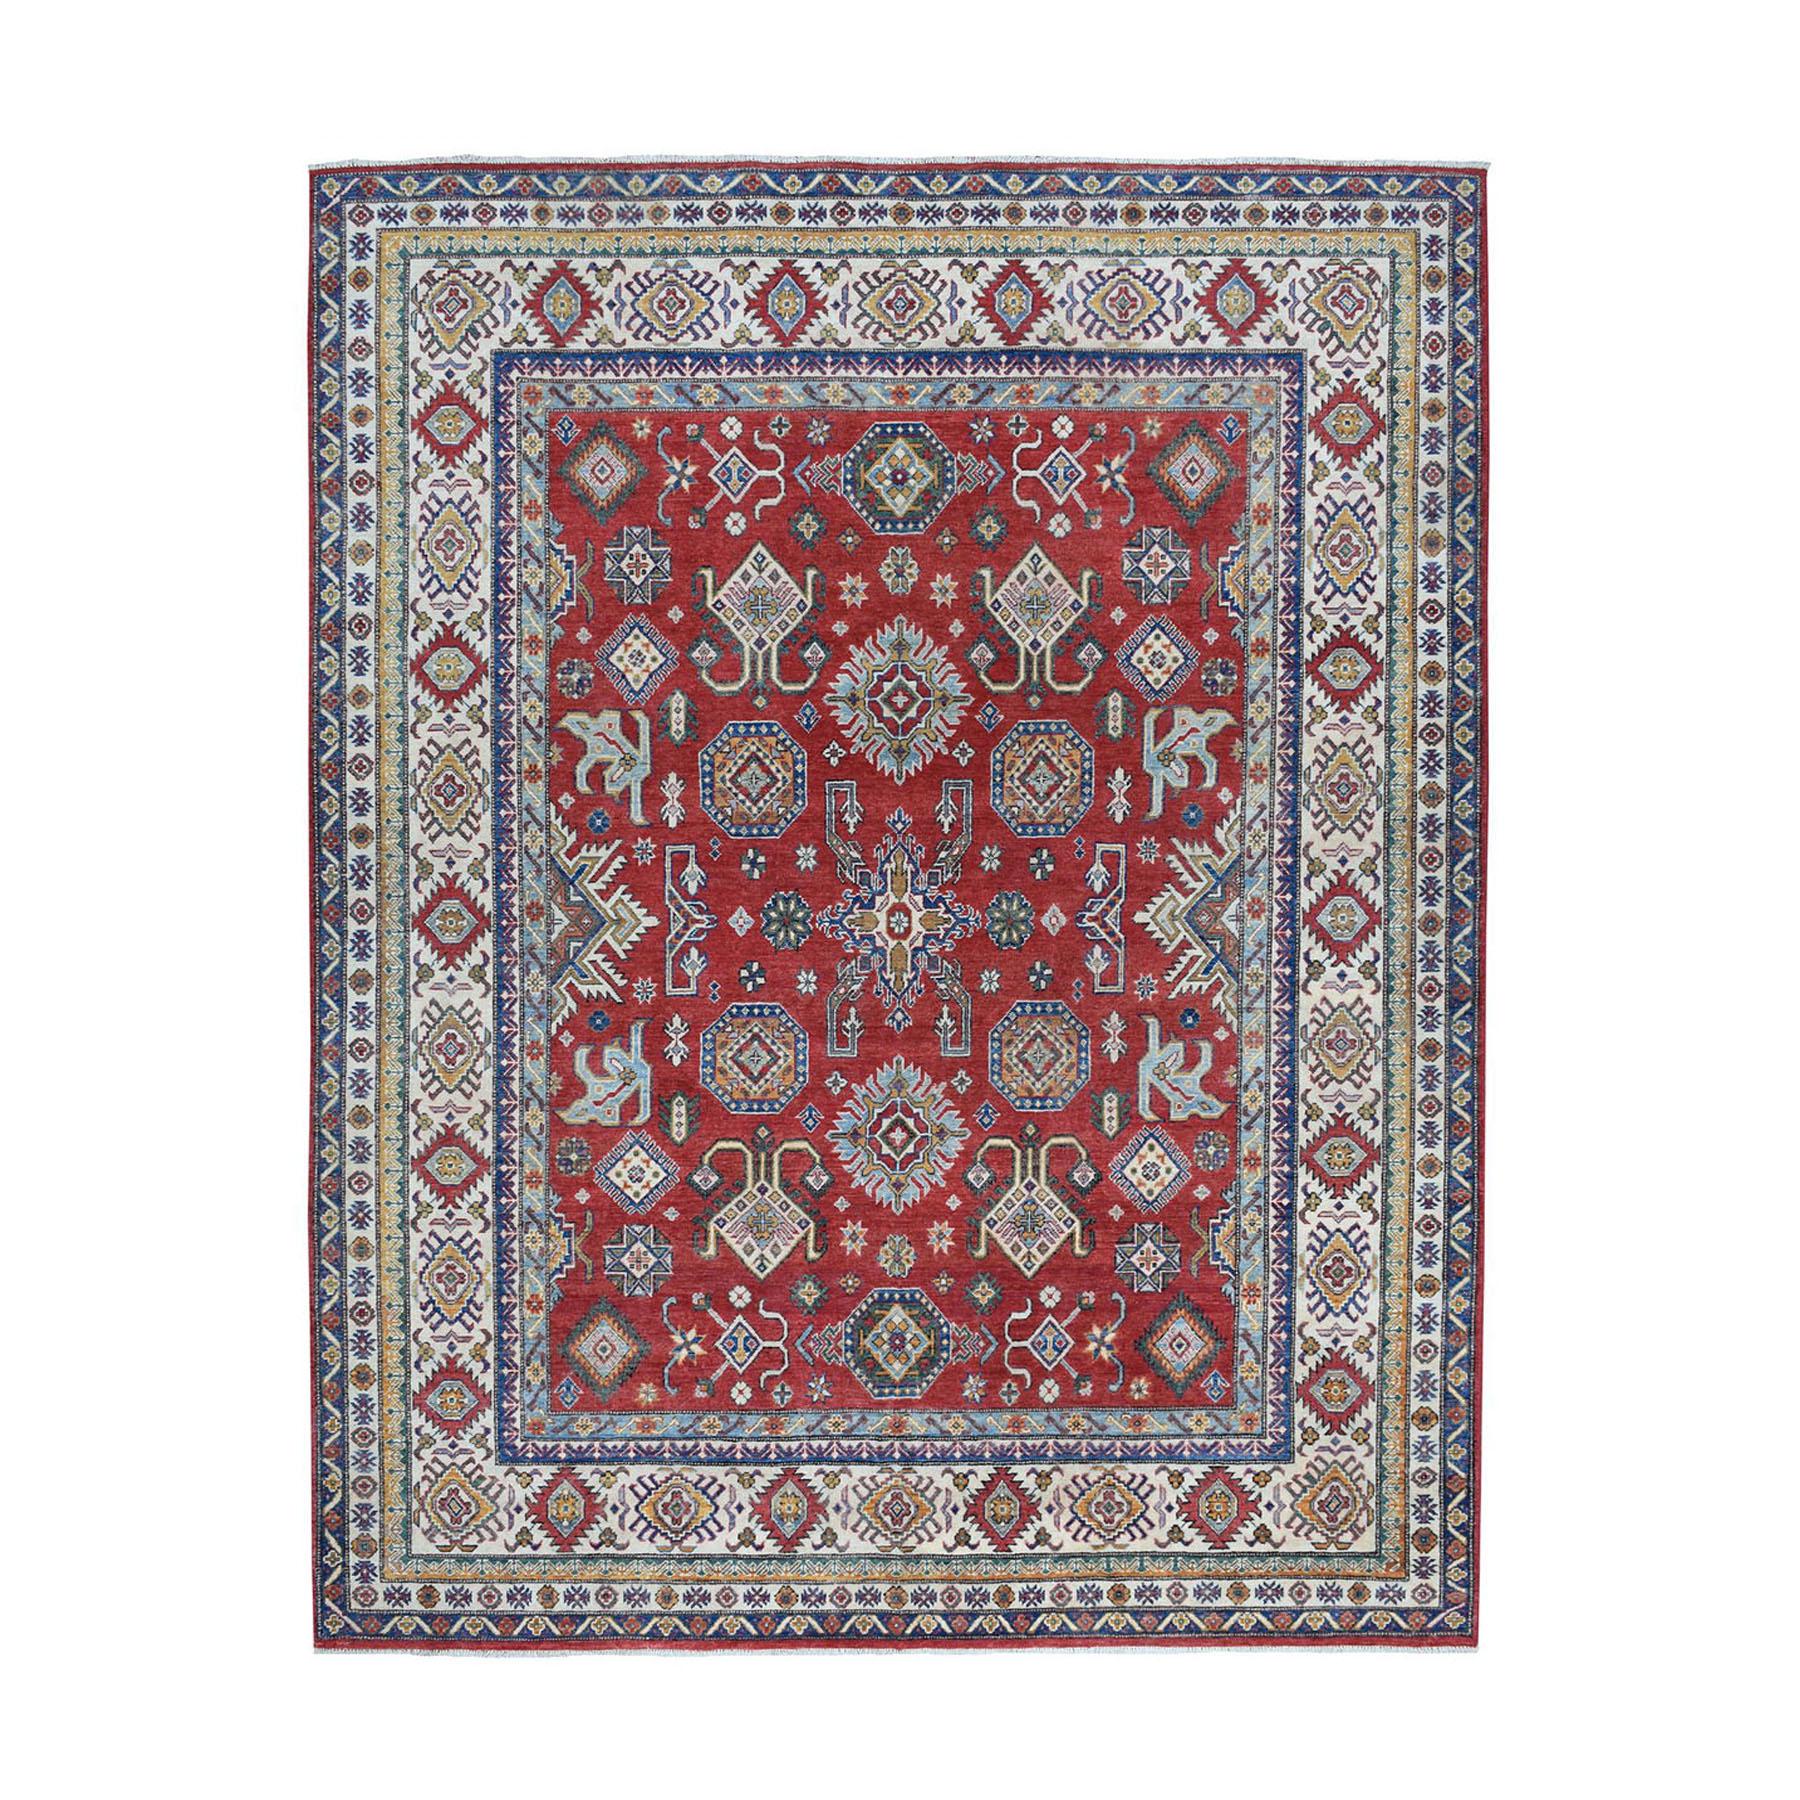 "8'2""x9'9"" Red Kazak Geometric Design Pure Wool Hand-Knotted Oriental Rug"